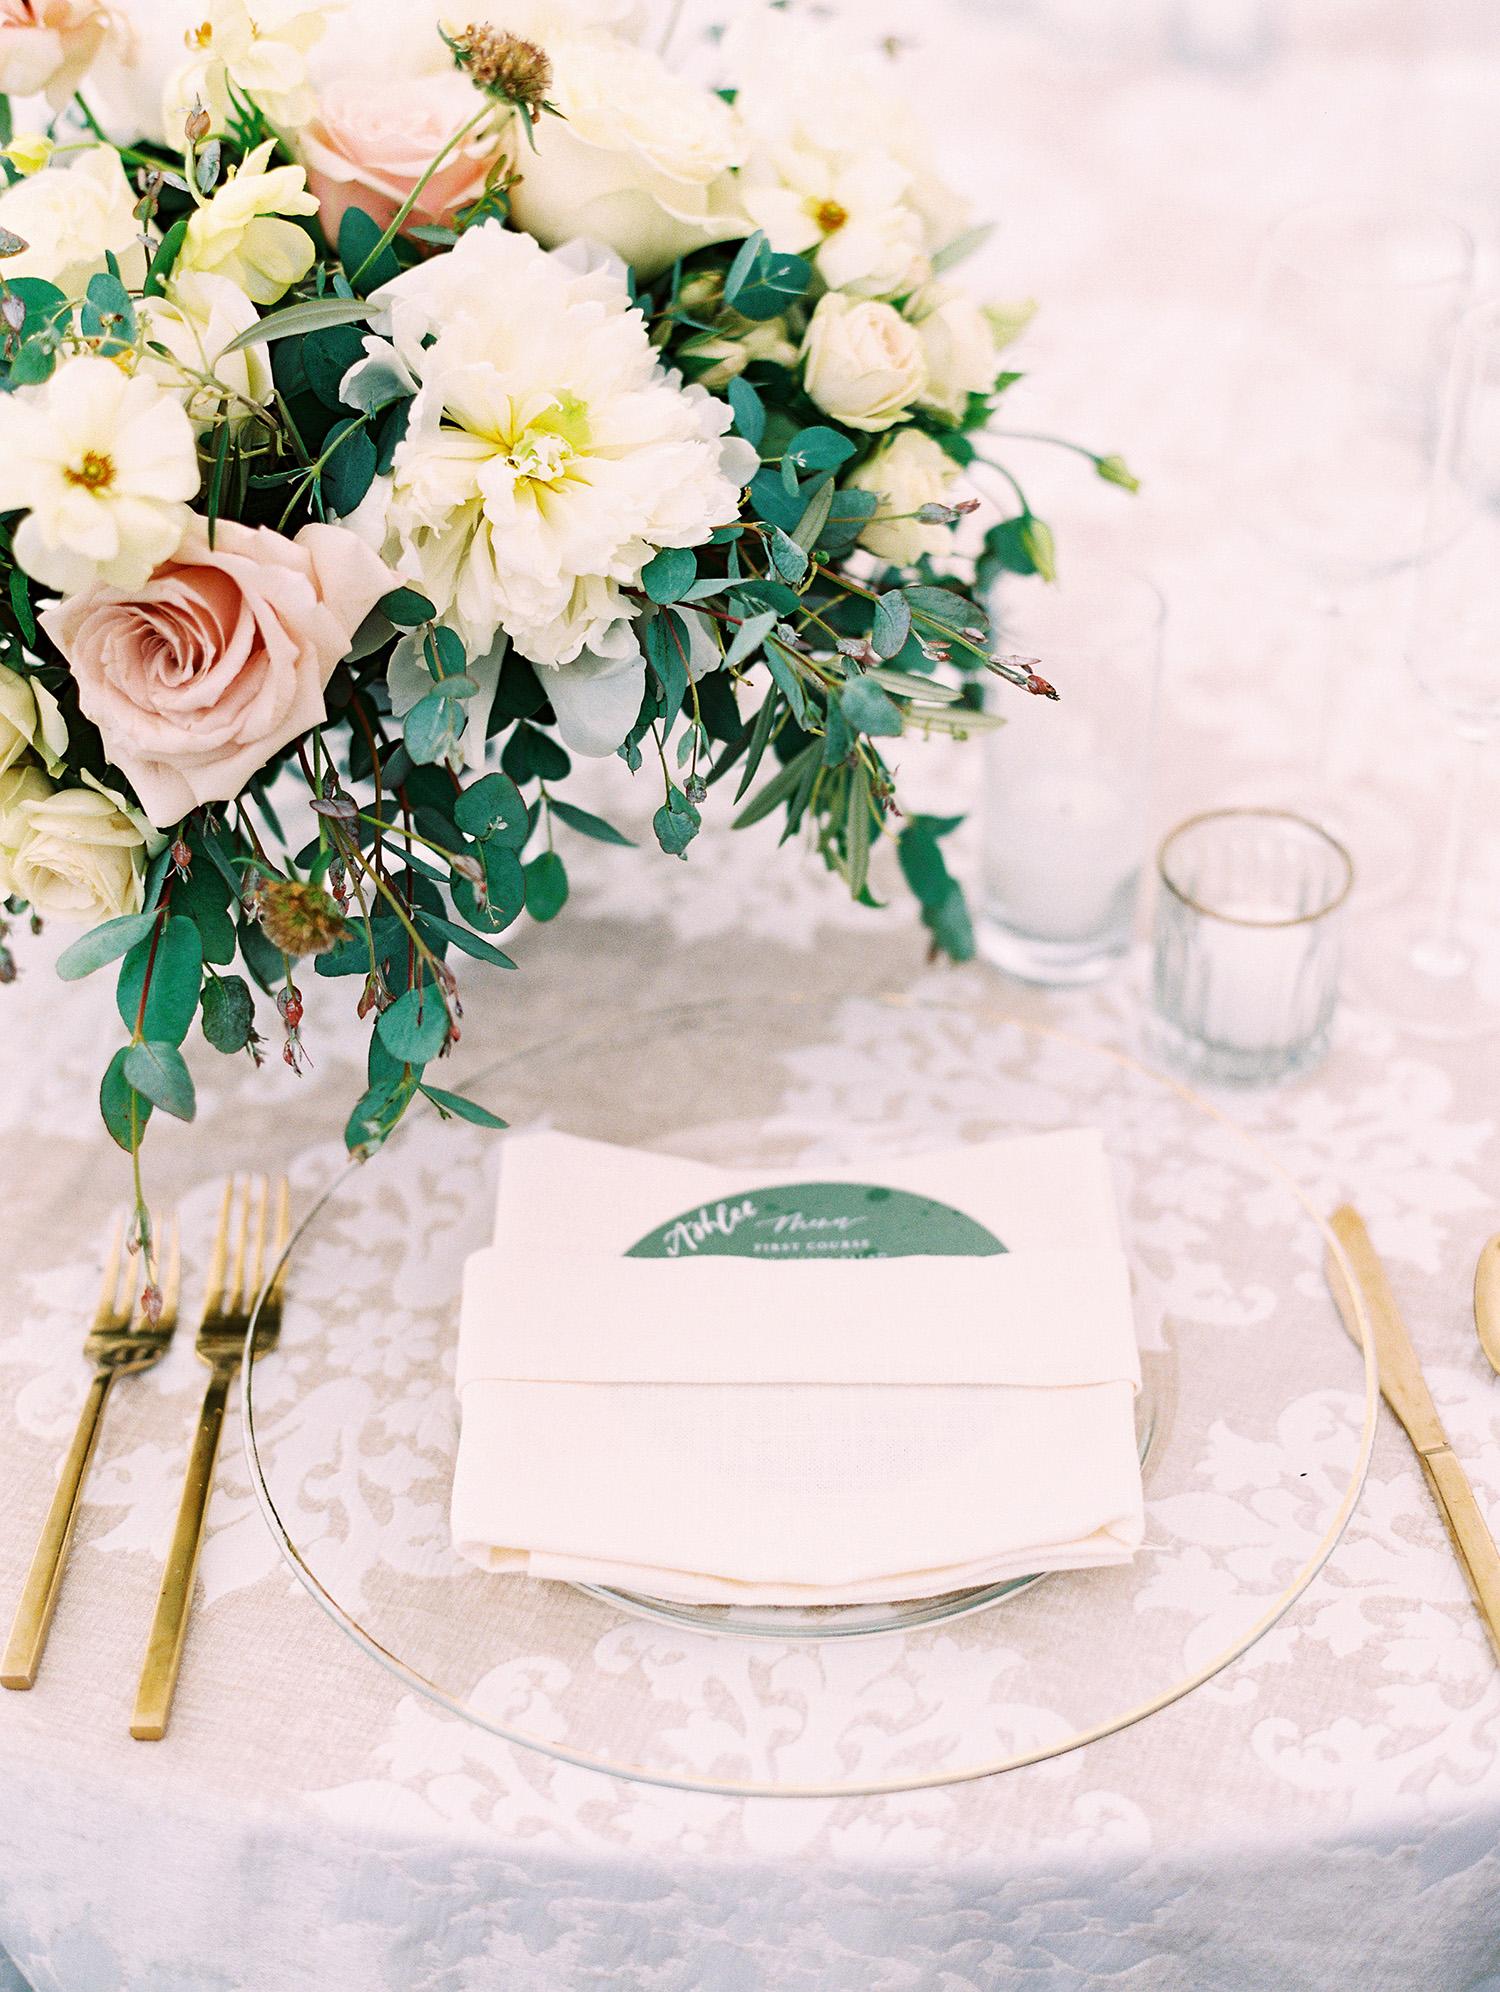 kati erik wedding place settings reception